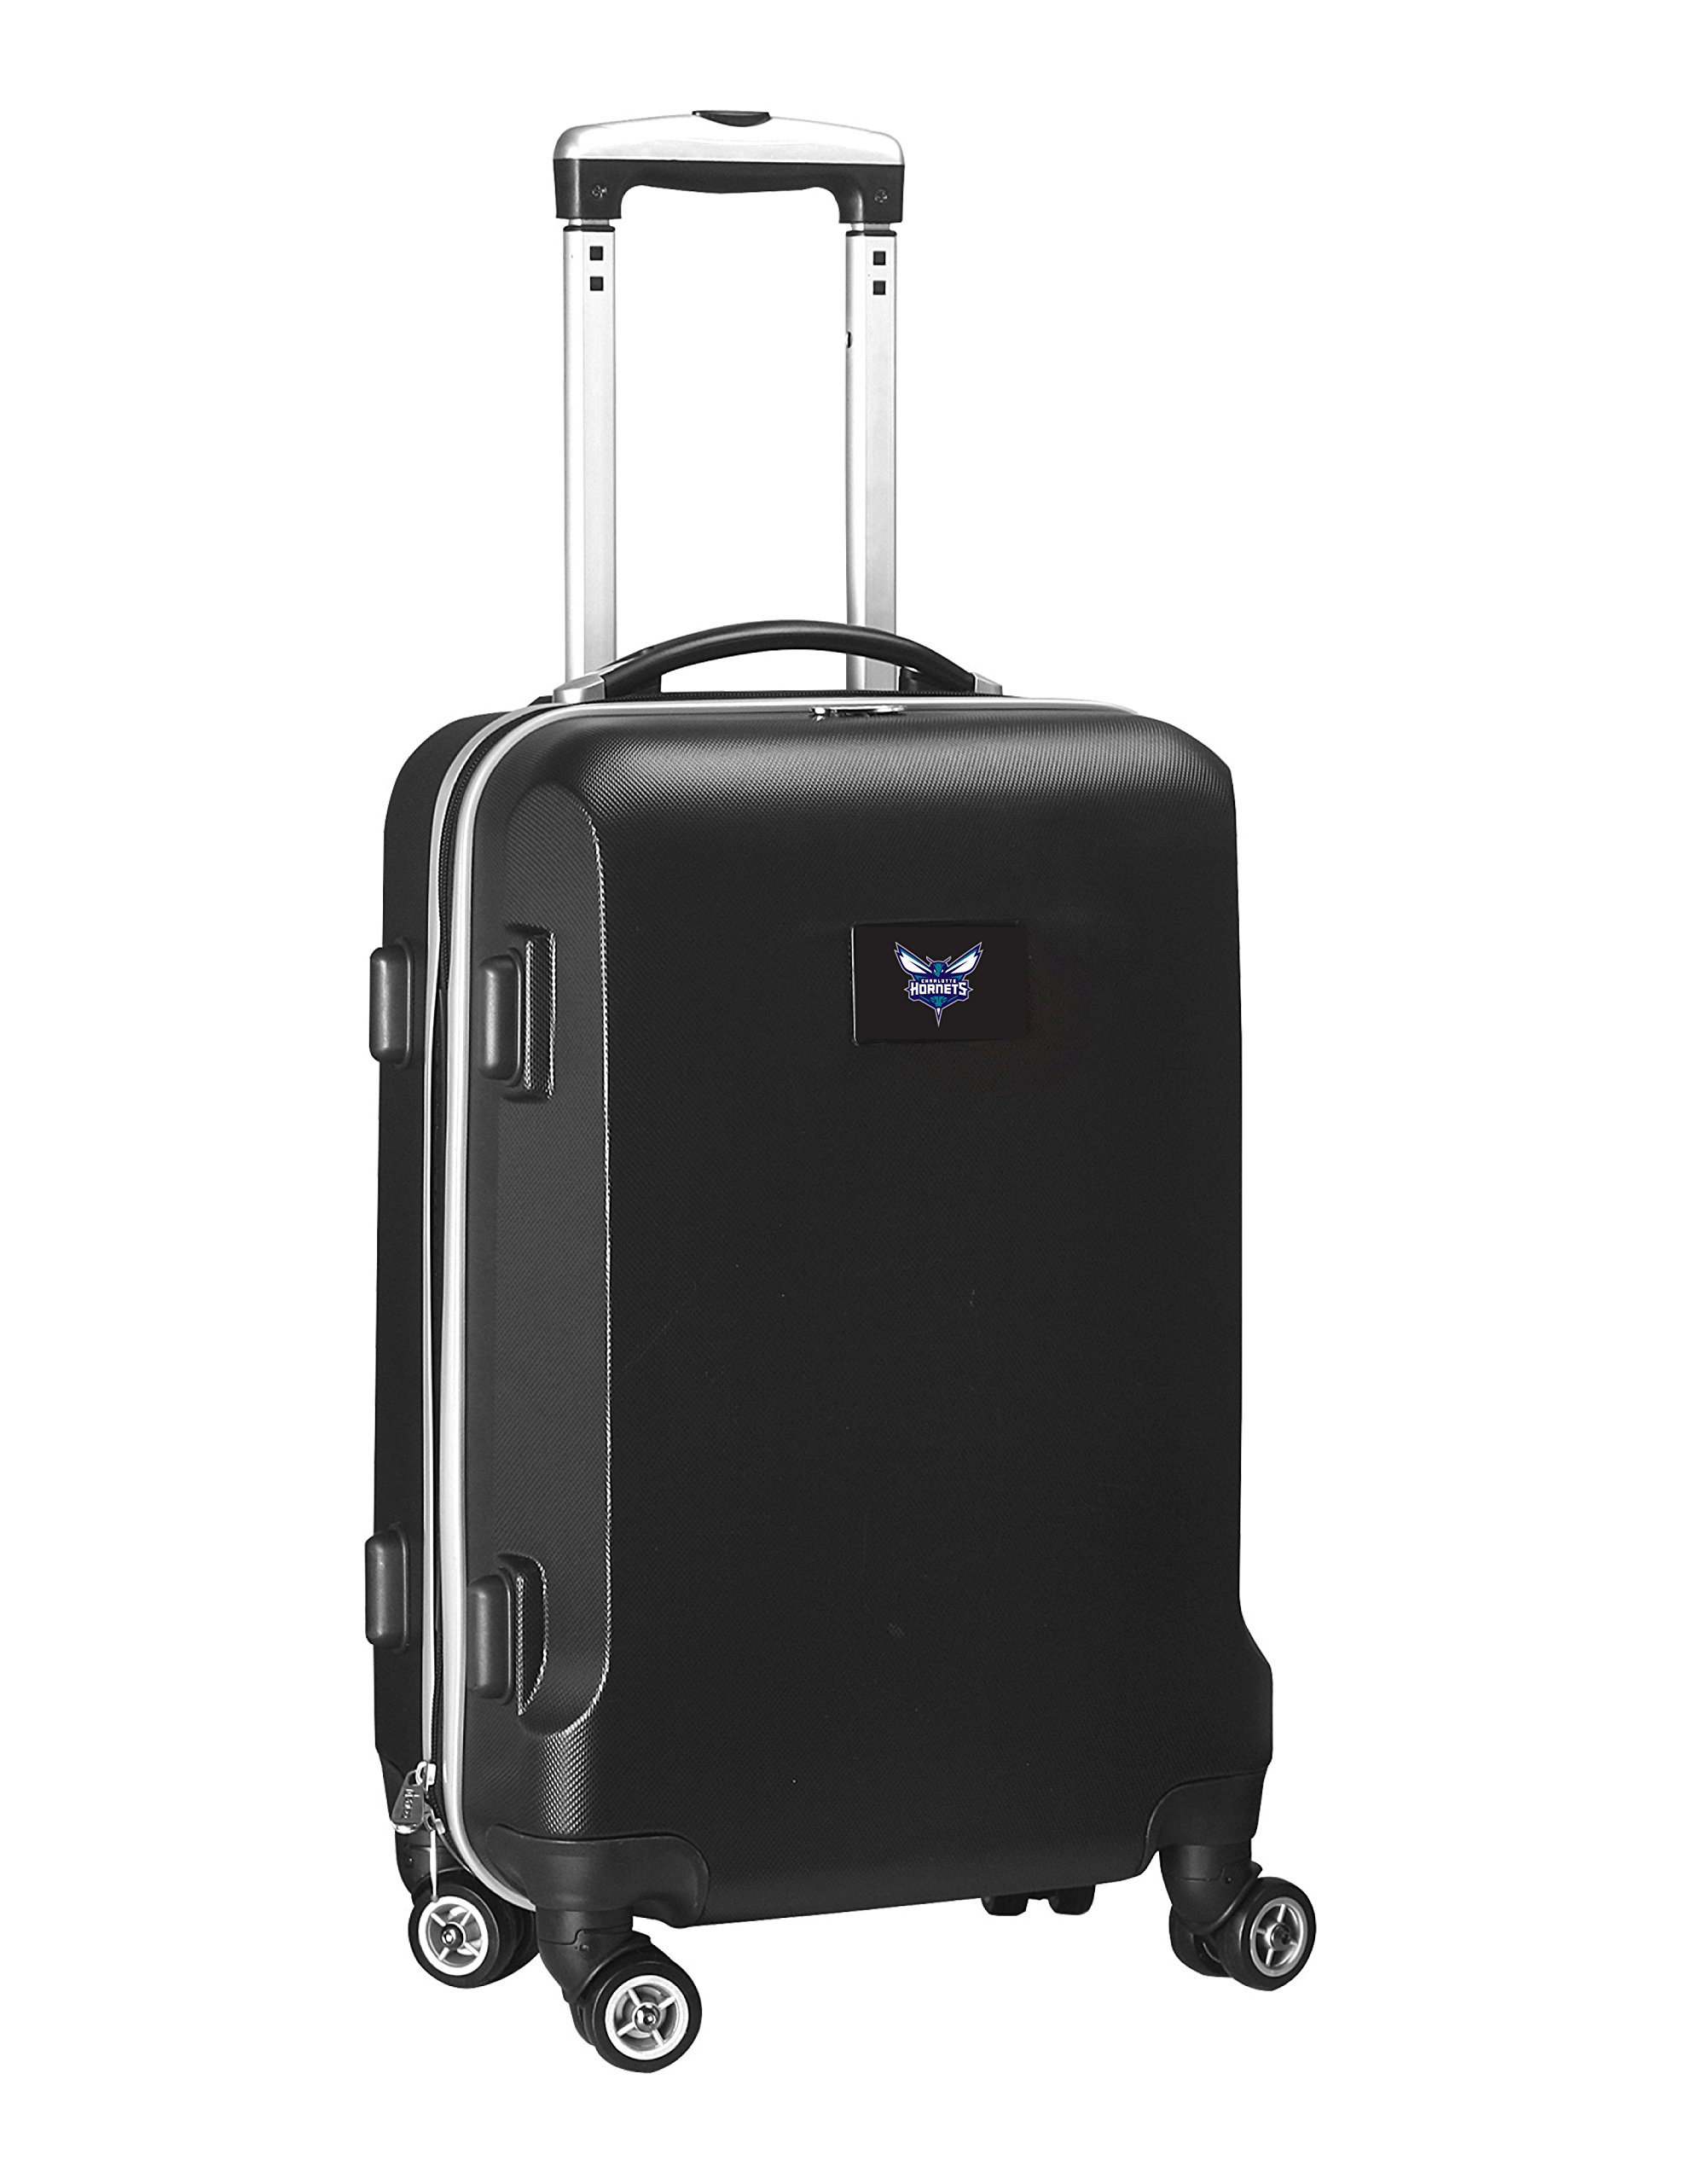 Denco NBA Charlotte Hornets Carry-On Hardcase Luggage Spinner, Black by Denco (Image #1)